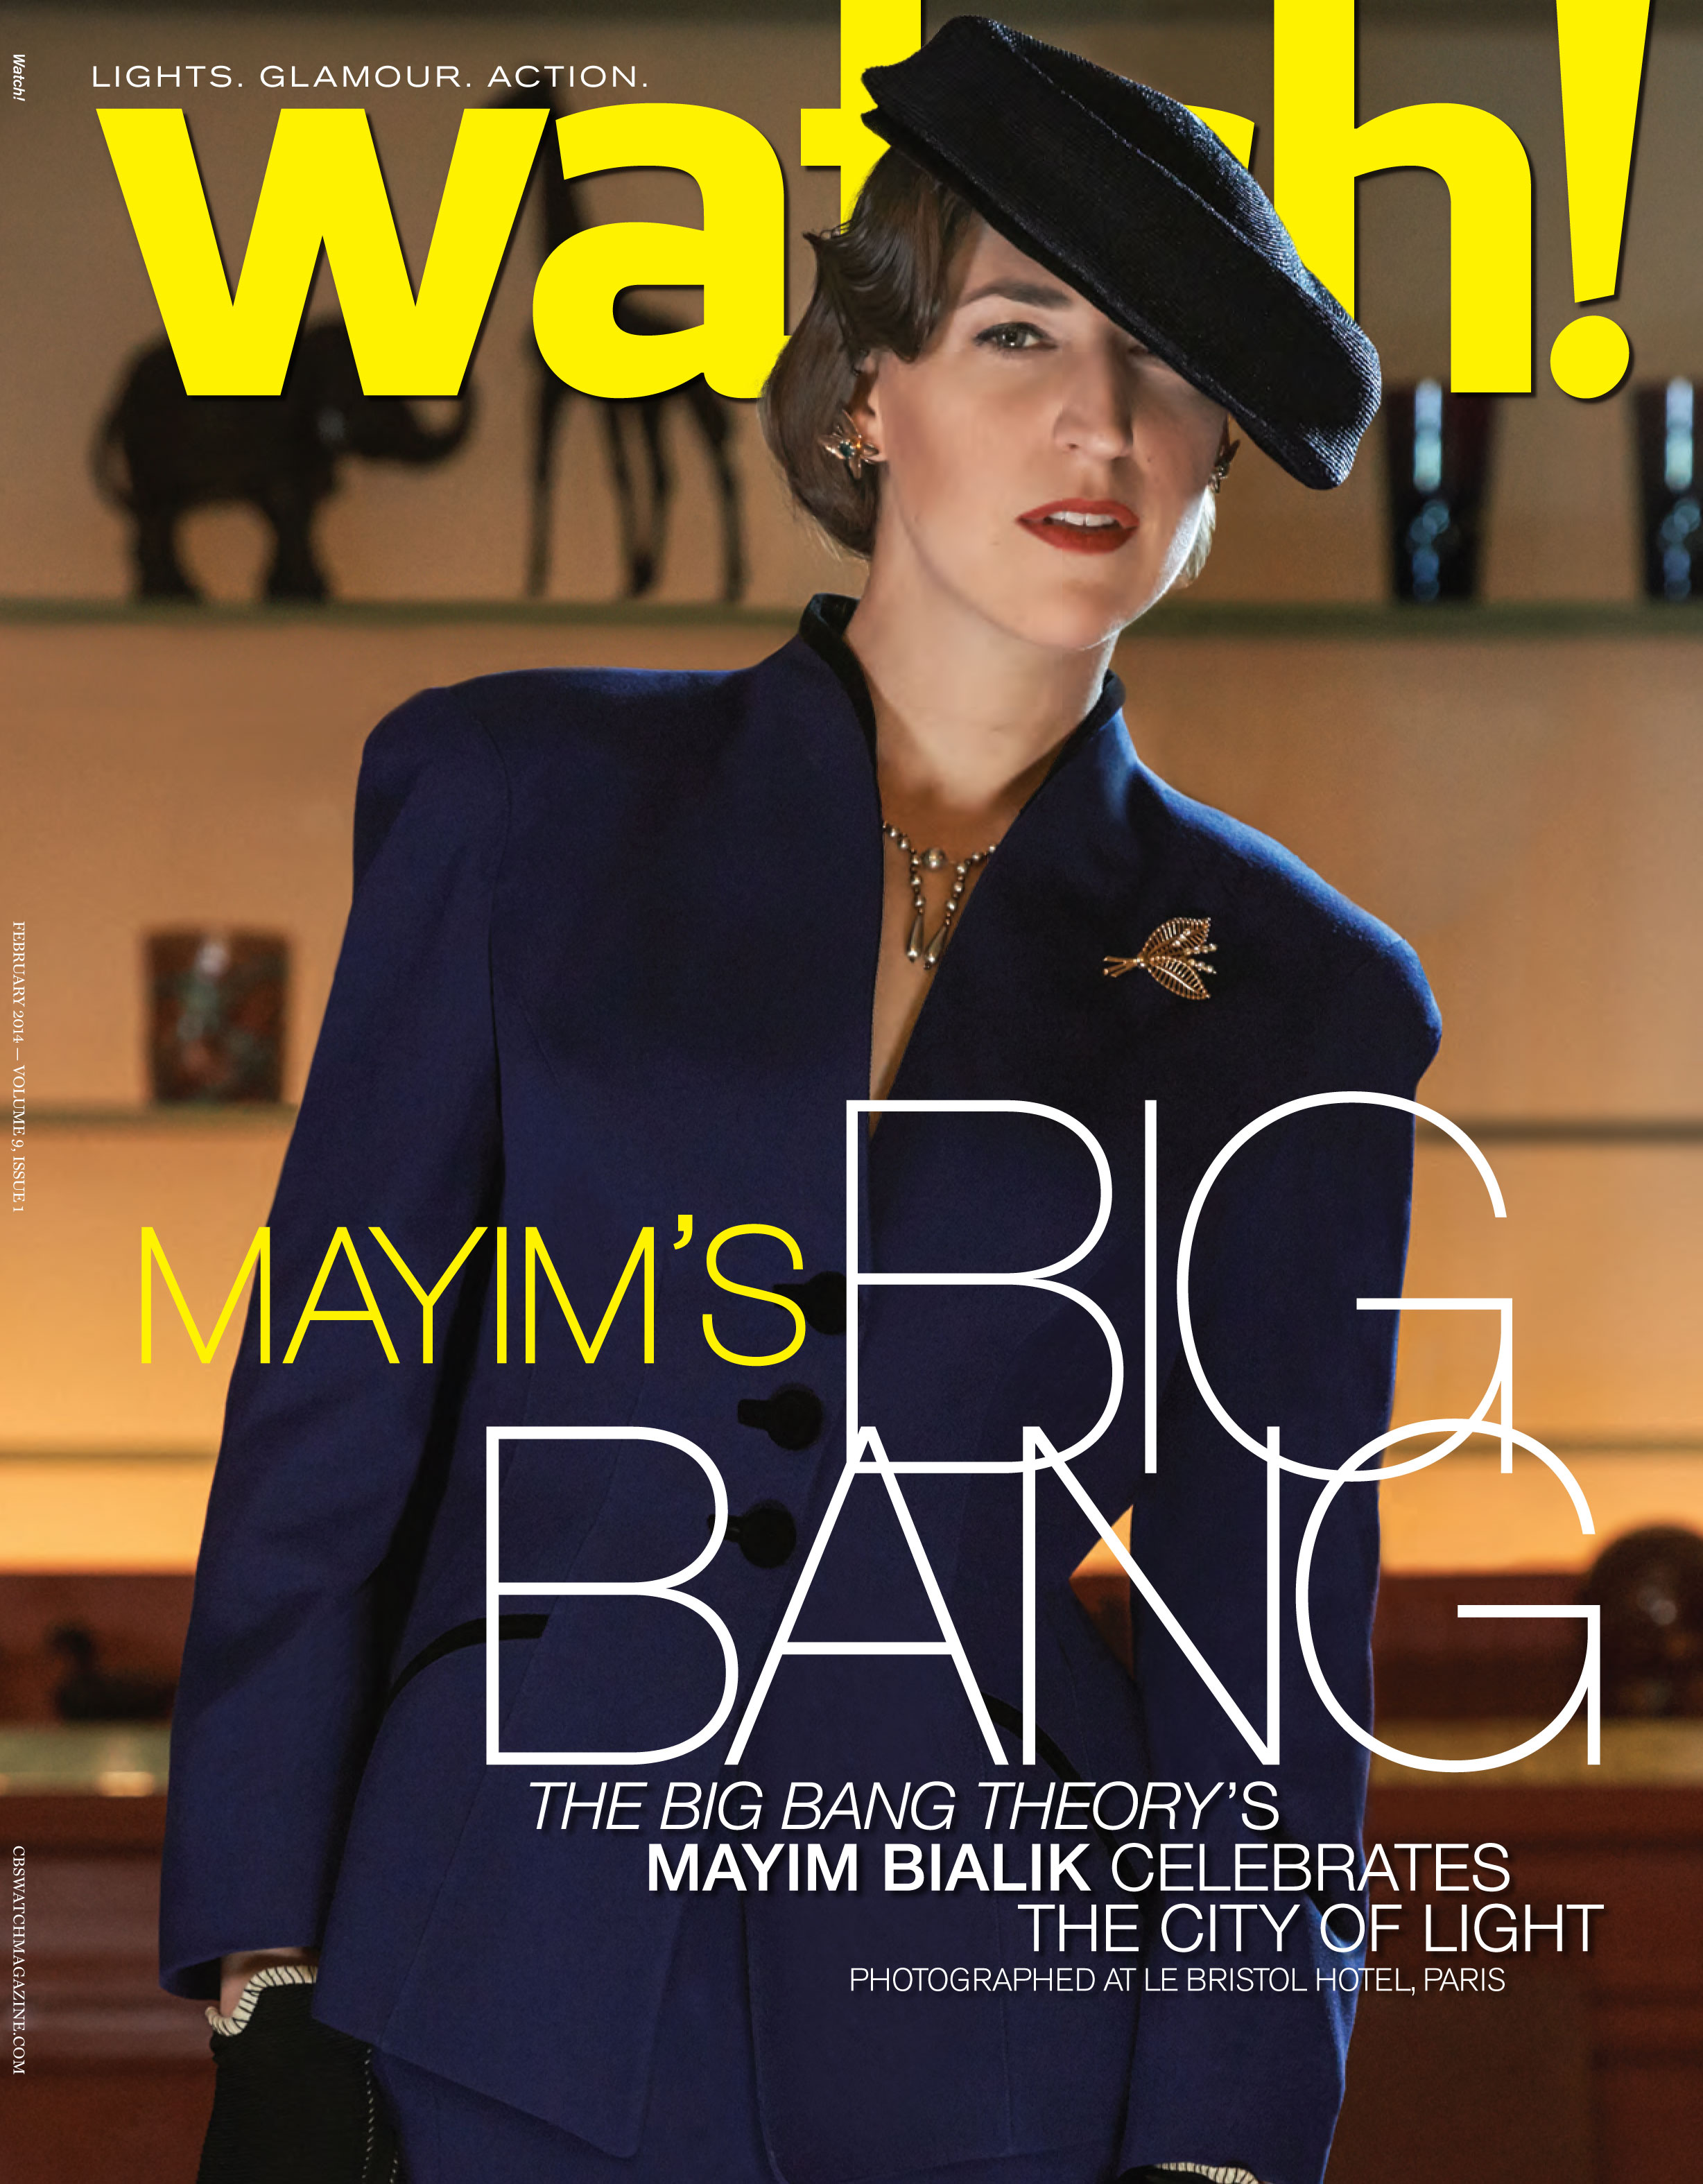 The Big Bang Theory's Mayim Bialik Watch Magazine Cover